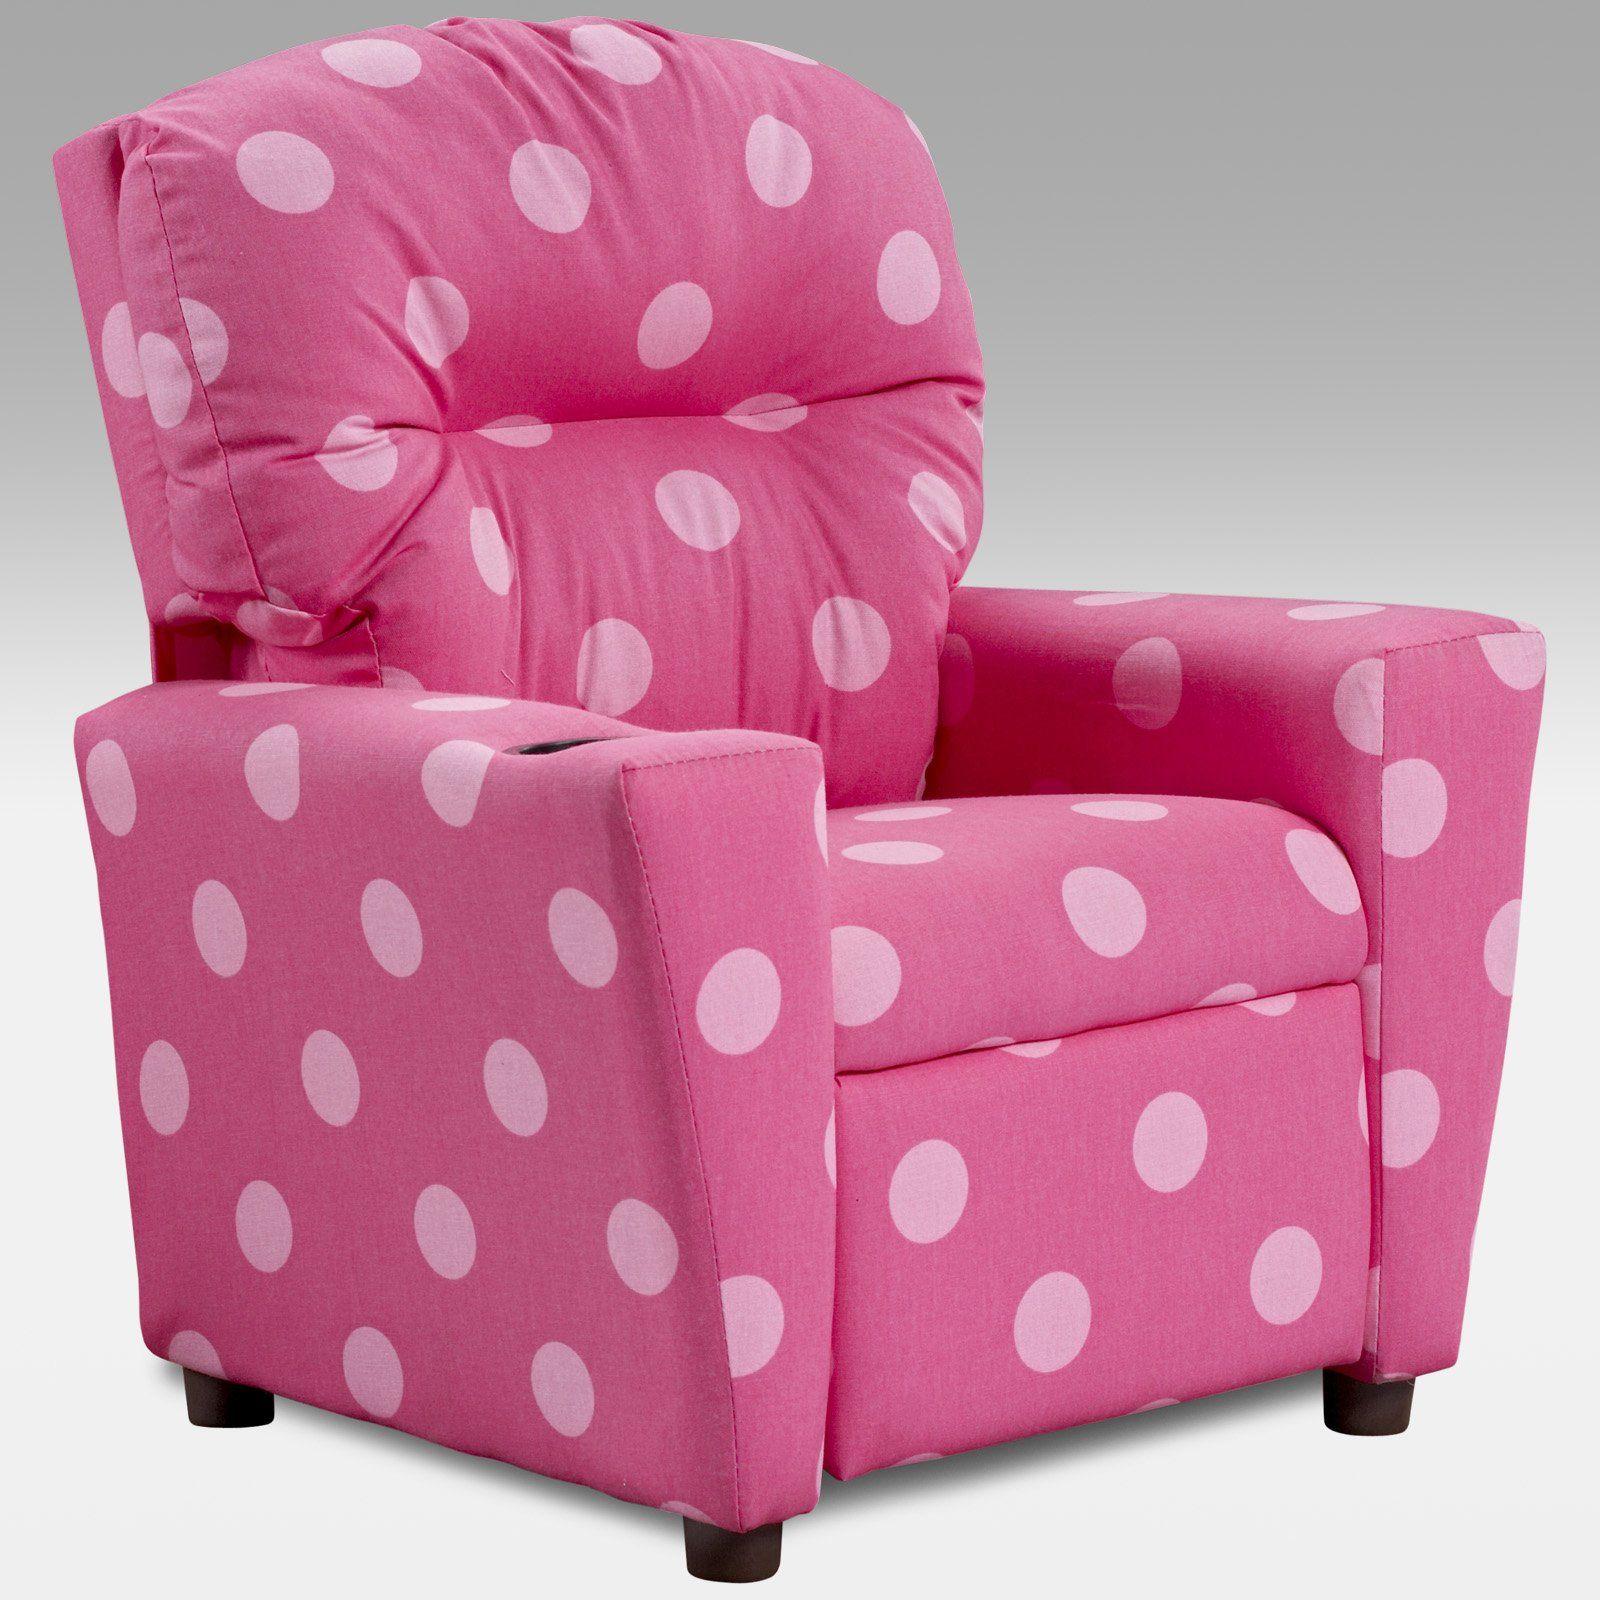 die besten 25 kinder relaxsessel ideen auf pinterest spielzimmer m bel h ngesessel st nder. Black Bedroom Furniture Sets. Home Design Ideas